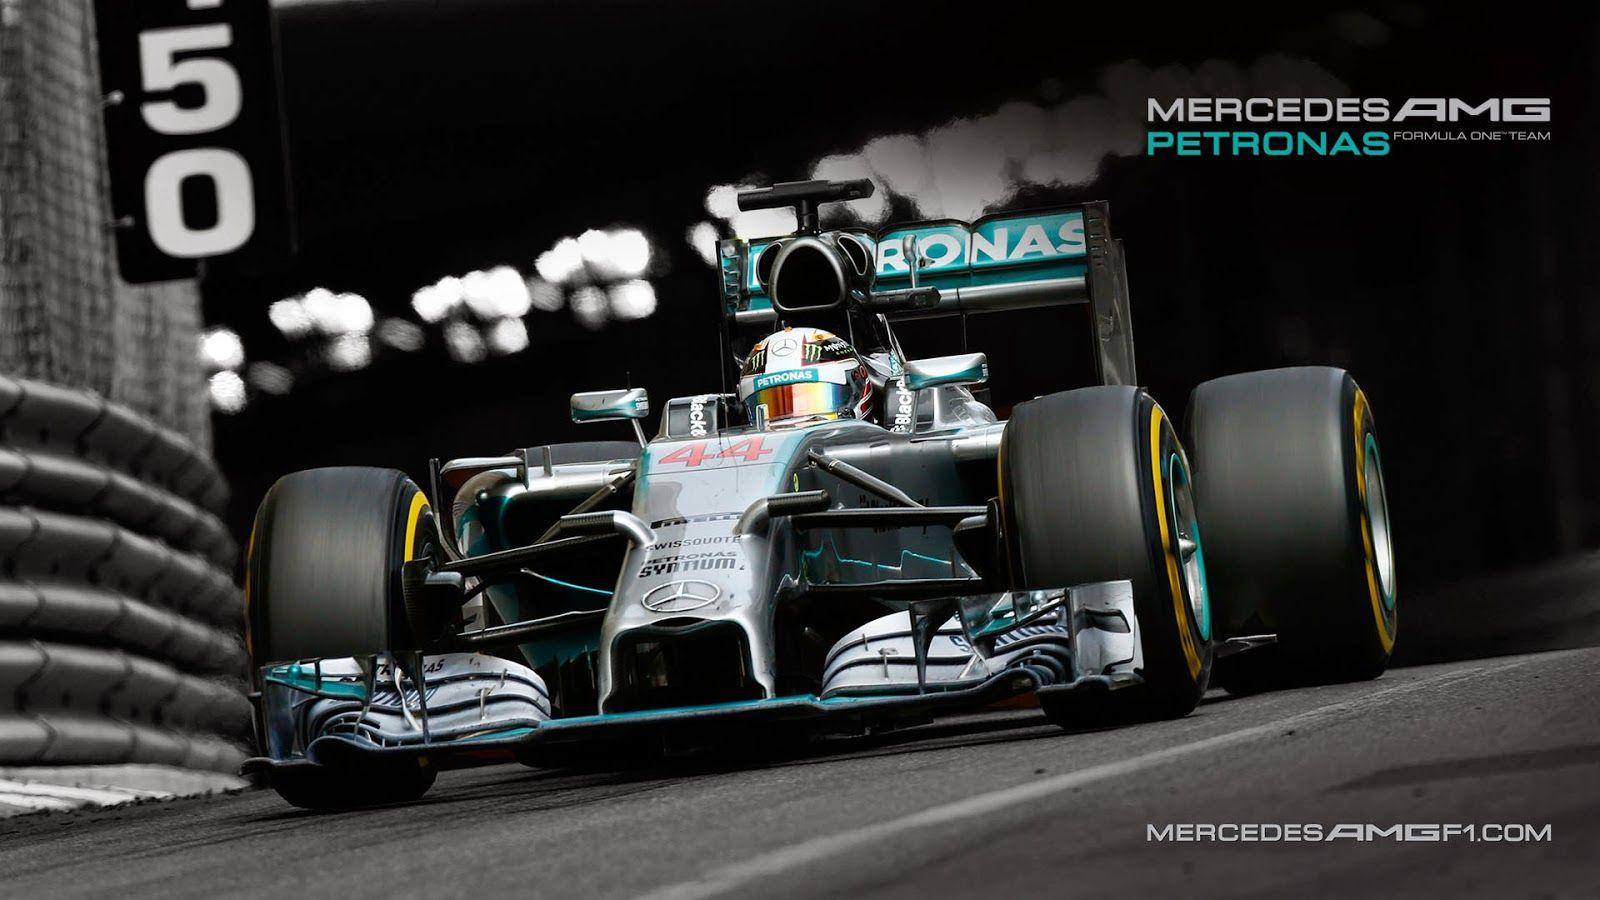 F1 Wallpaper Full HD #87y | Cars | Pinterest | Mercedes wallpaper, Team wallpaper and Character ...